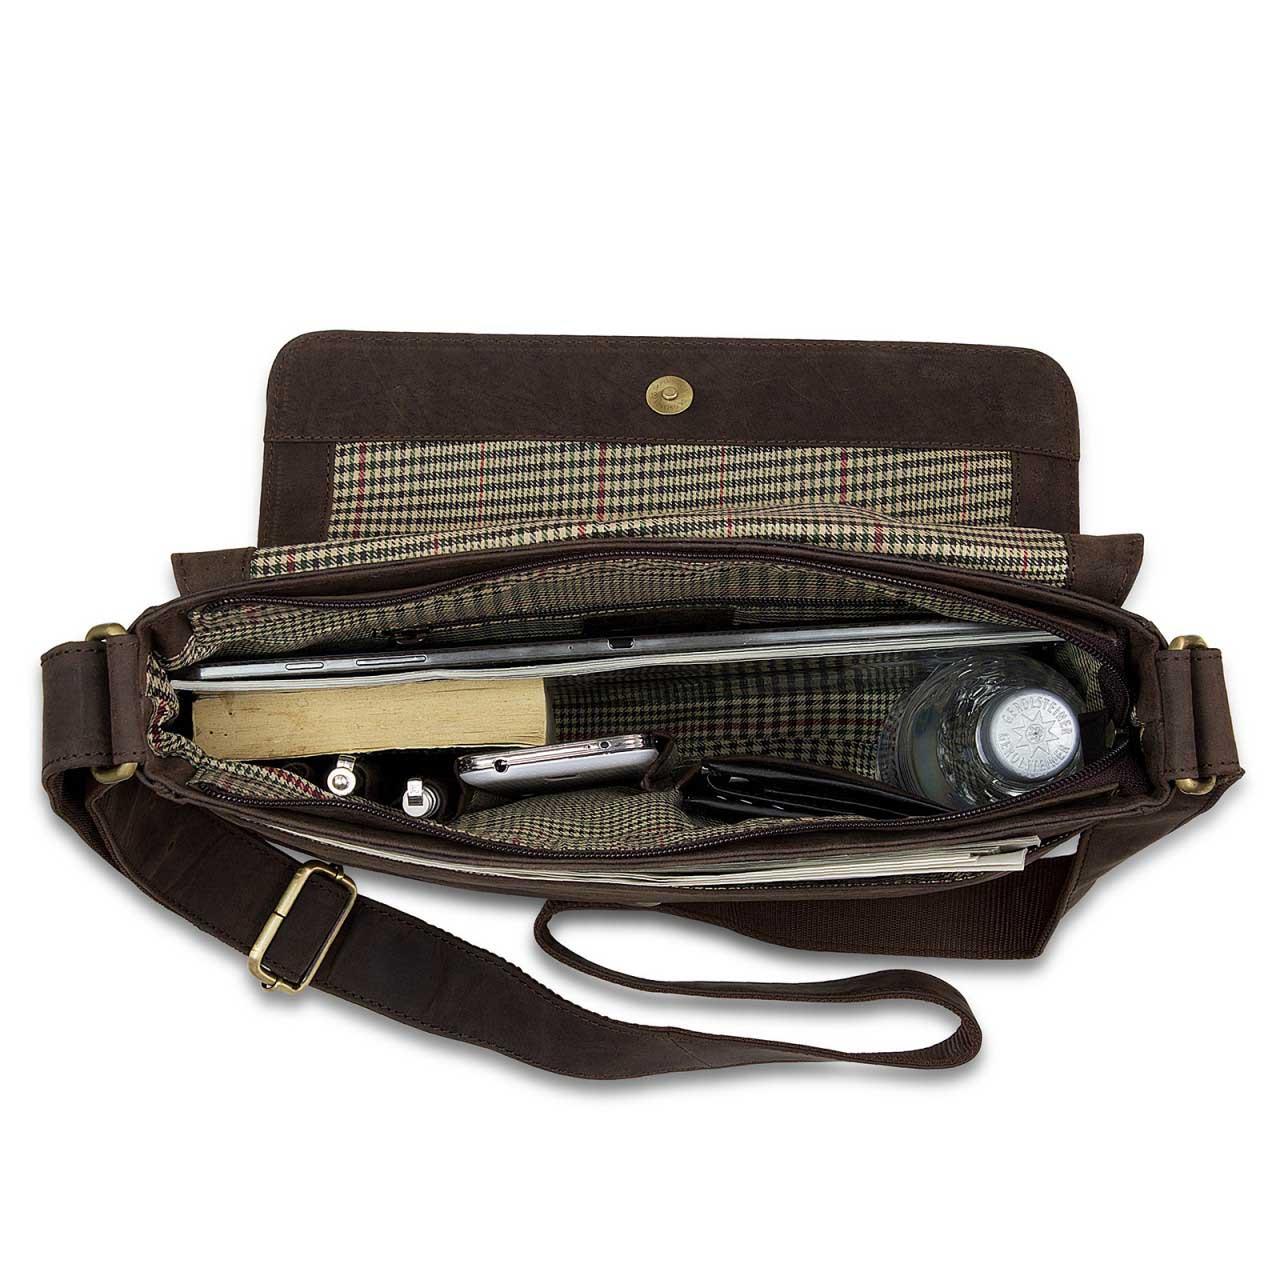 STILORD Leder Messenger Bag kompakt Vintage Schulter Umhängetasche 12.2 Zoll Tablets MacBook Tasche echtes Leder dunkelbraun - Bild 6